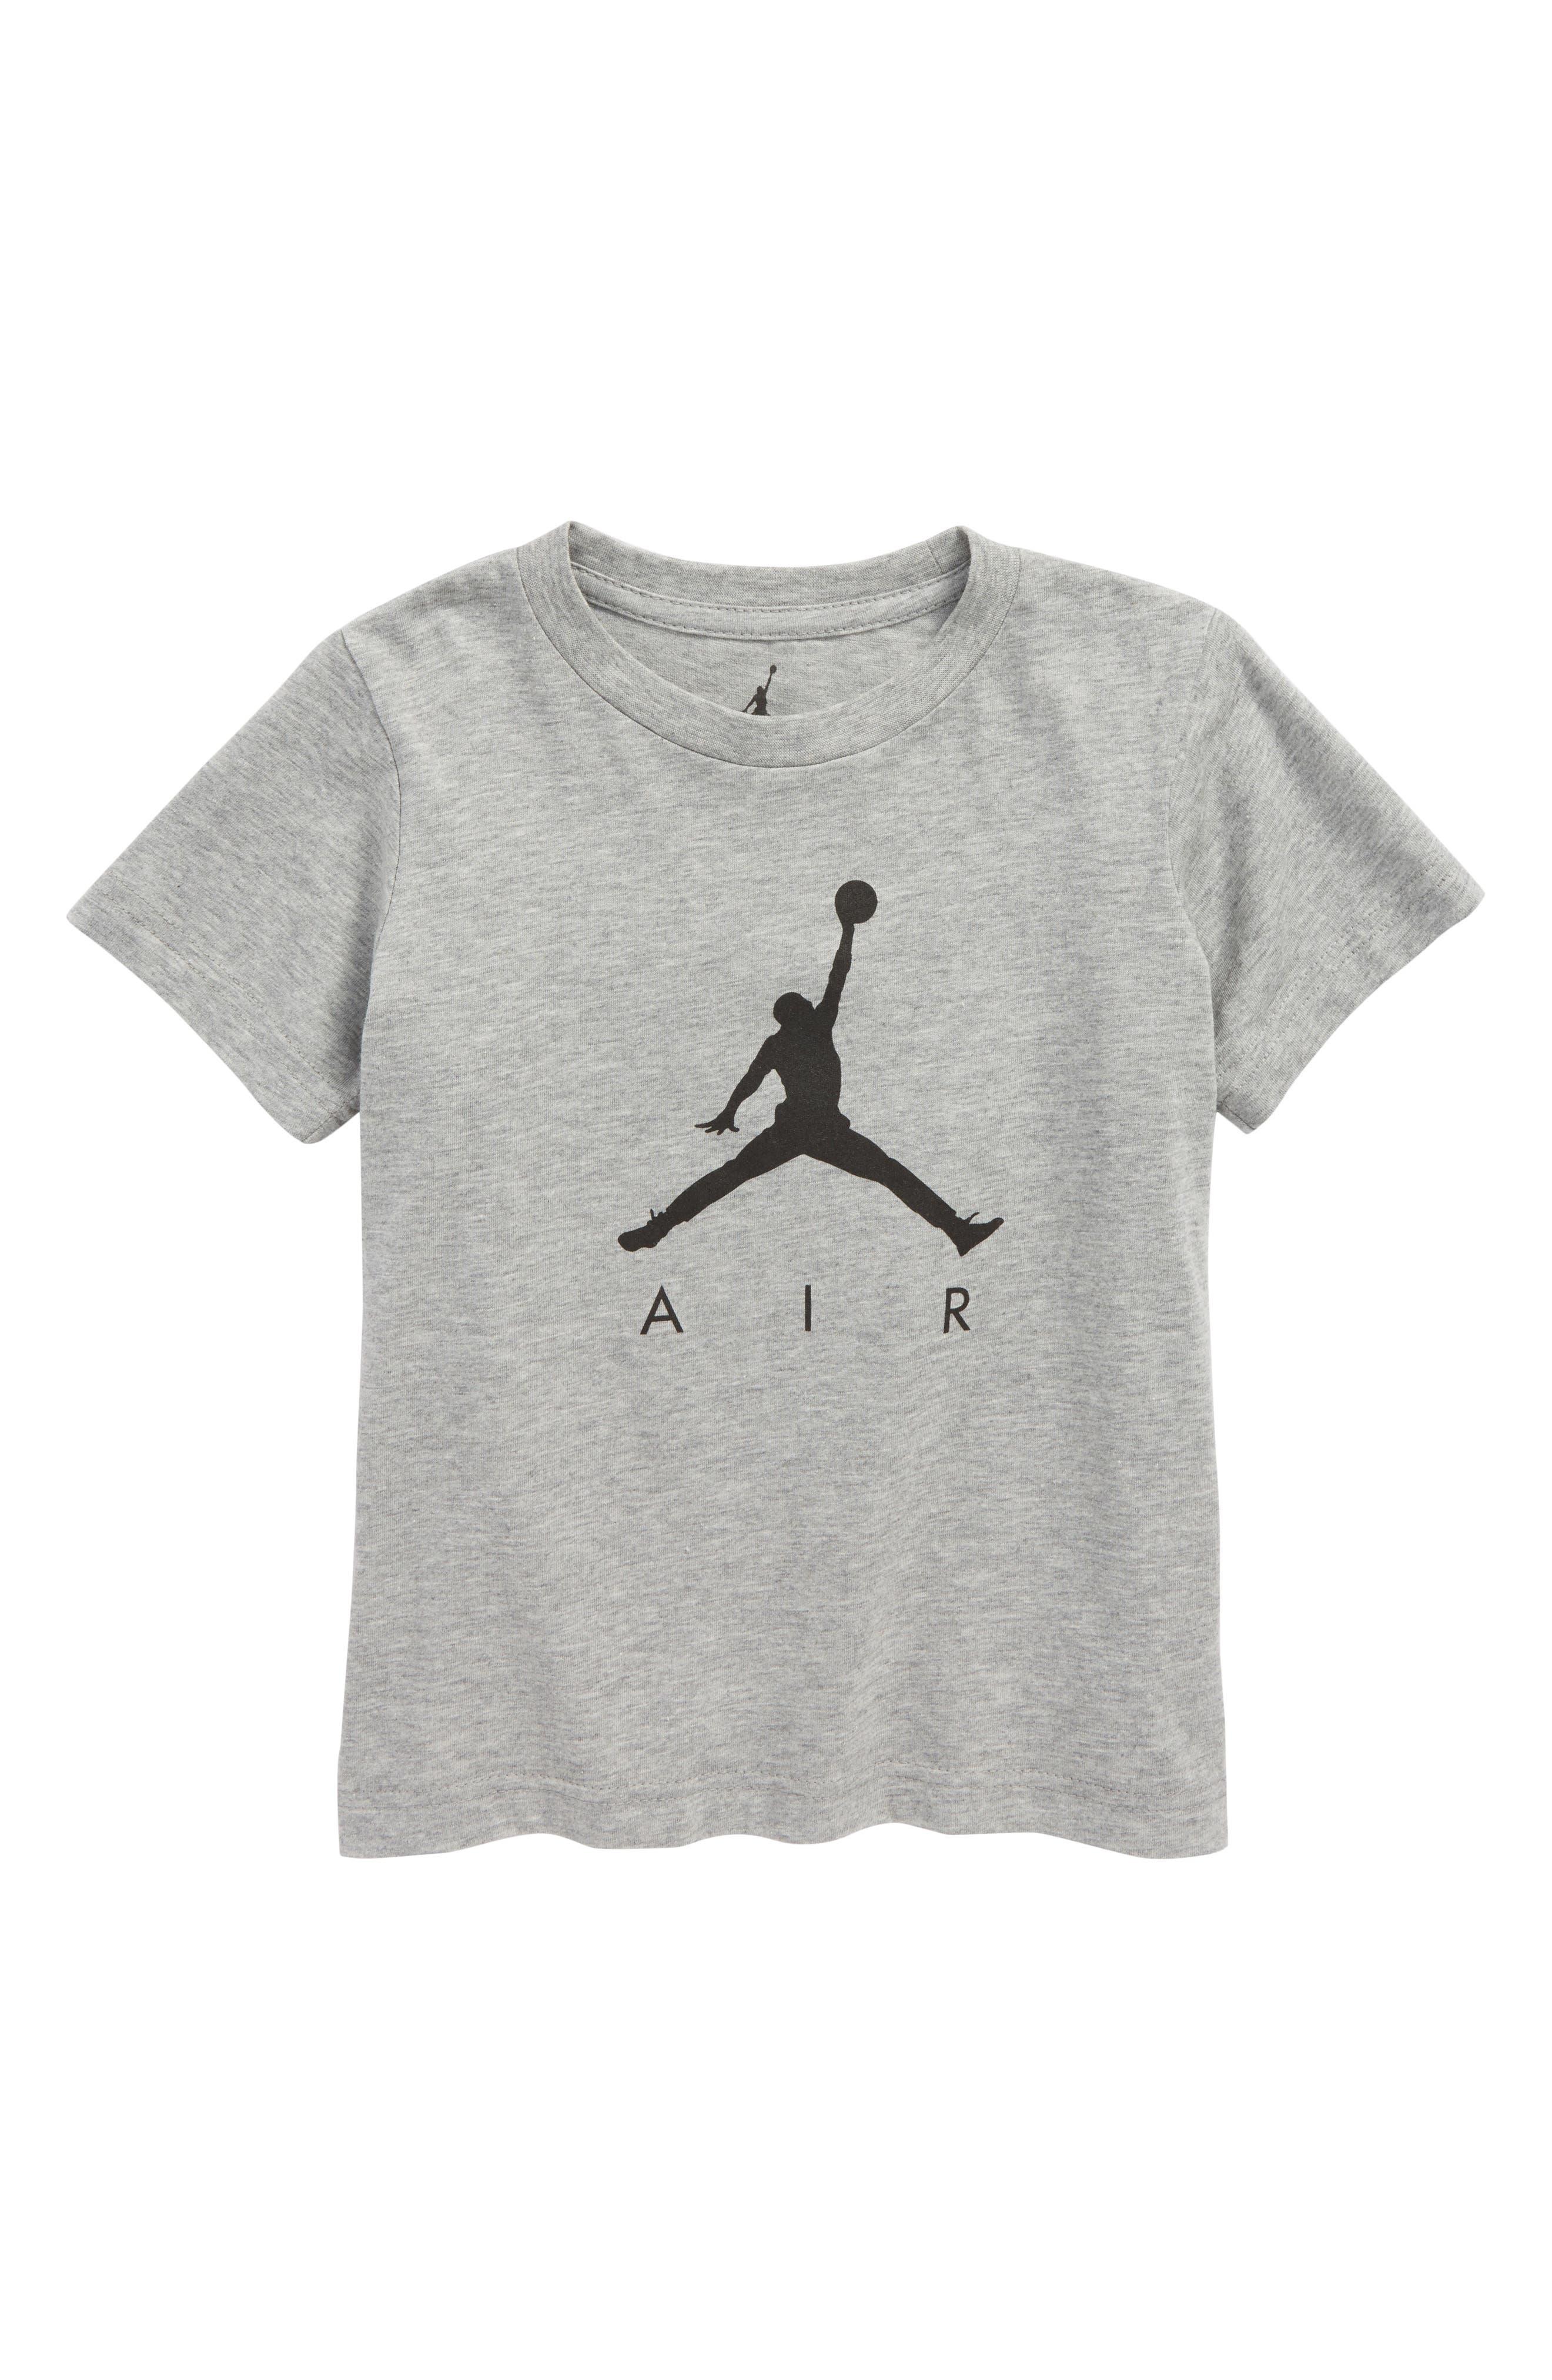 Main Image - Jordan AJ3 Graphic T-Shirt (Toddler Boys & Little Boys)